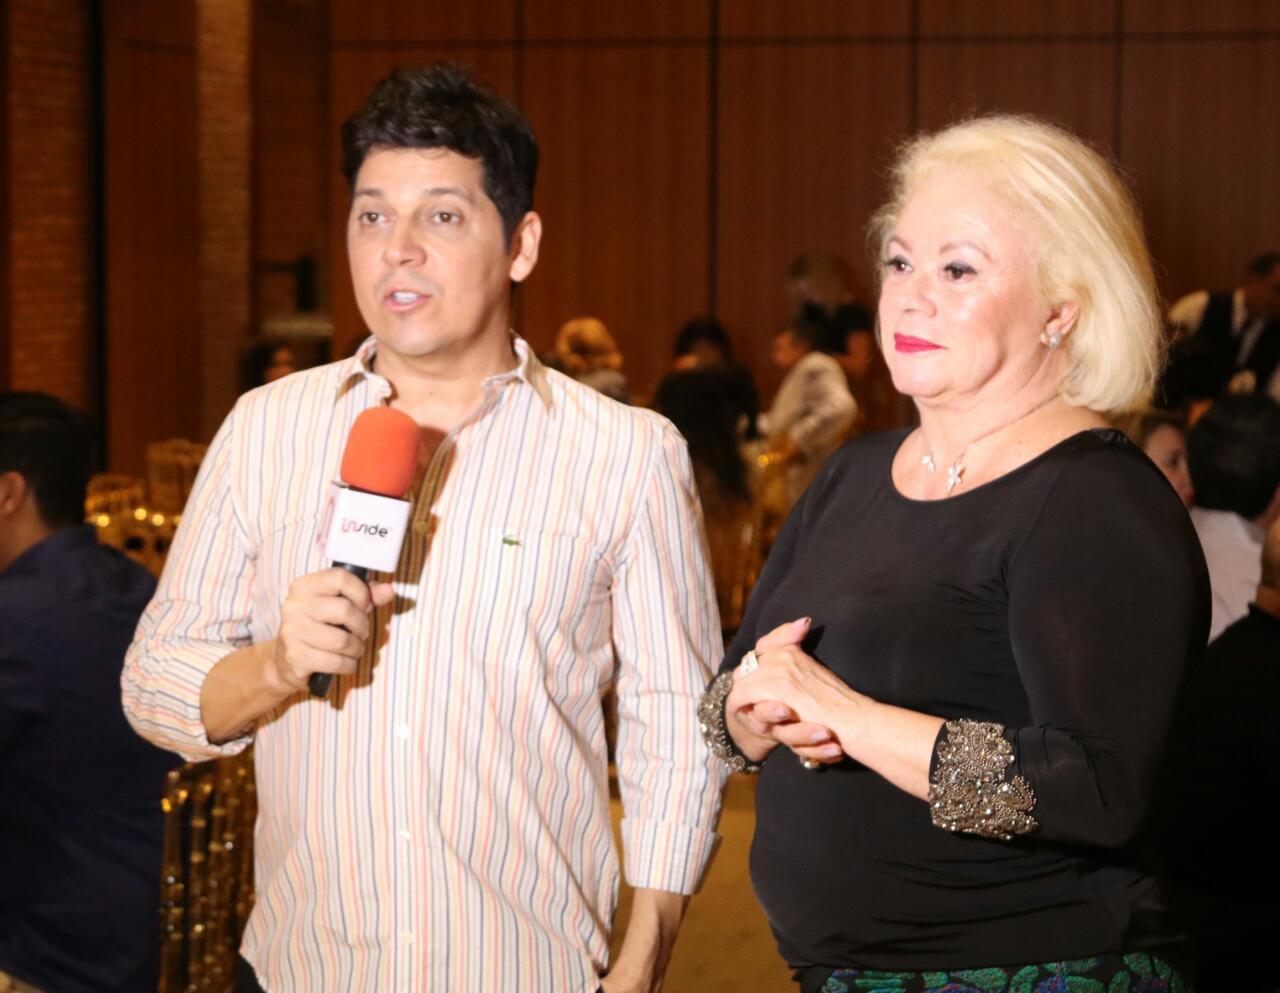 Jornalista Rivanildo Feitosa - Programa Inside TV - TV Meio Norte